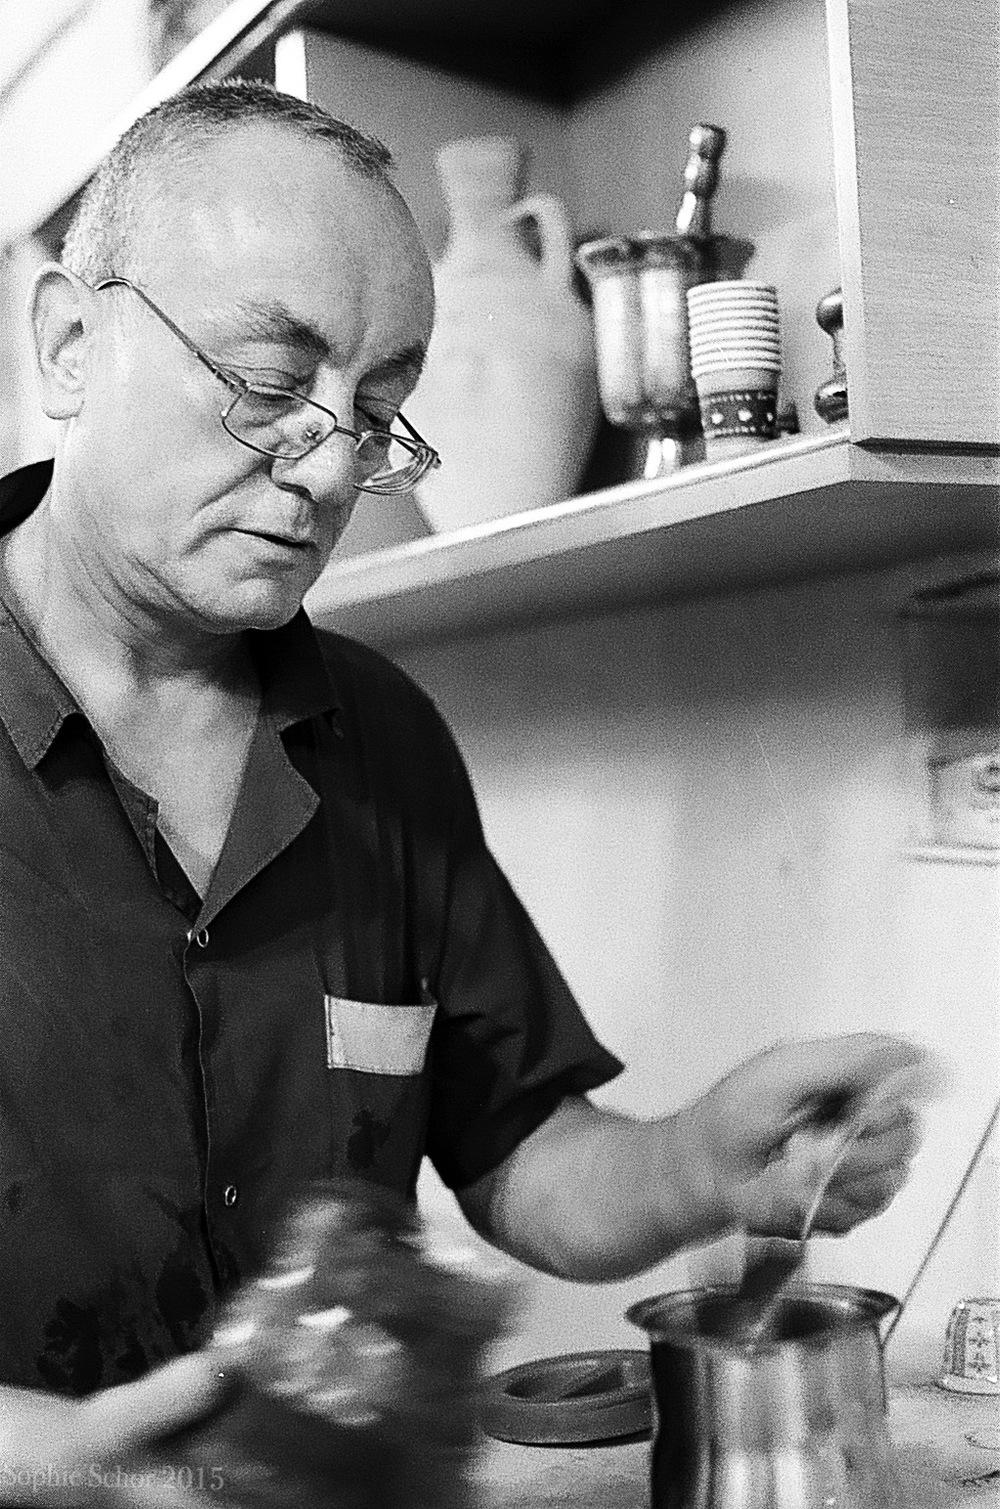 Coffee and Spice Vendor, Nazareth, August 2014